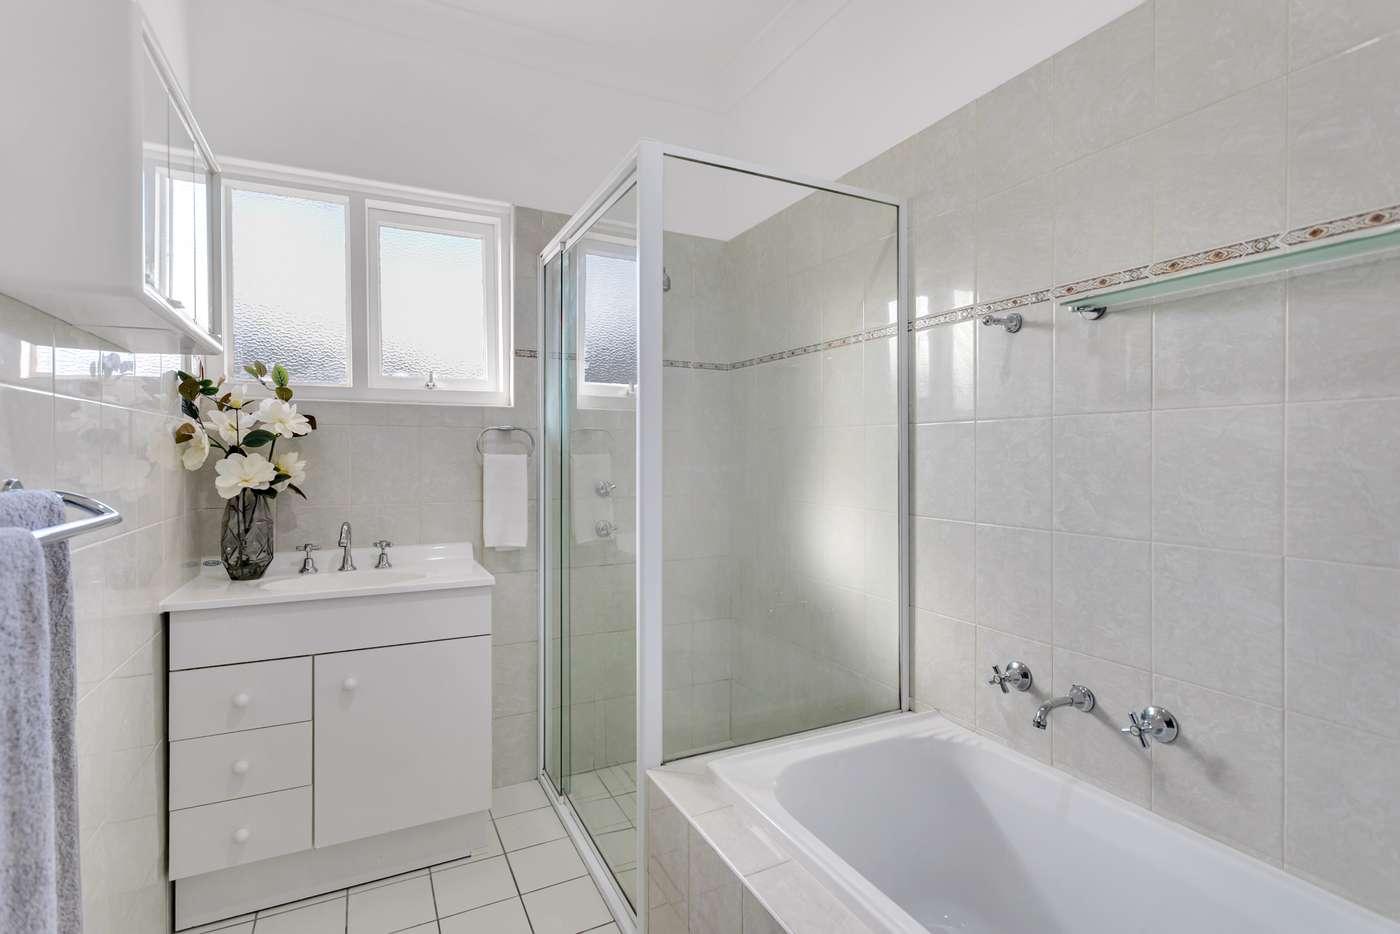 Sixth view of Homely house listing, 2 Louisa Street, Morphett Vale SA 5162